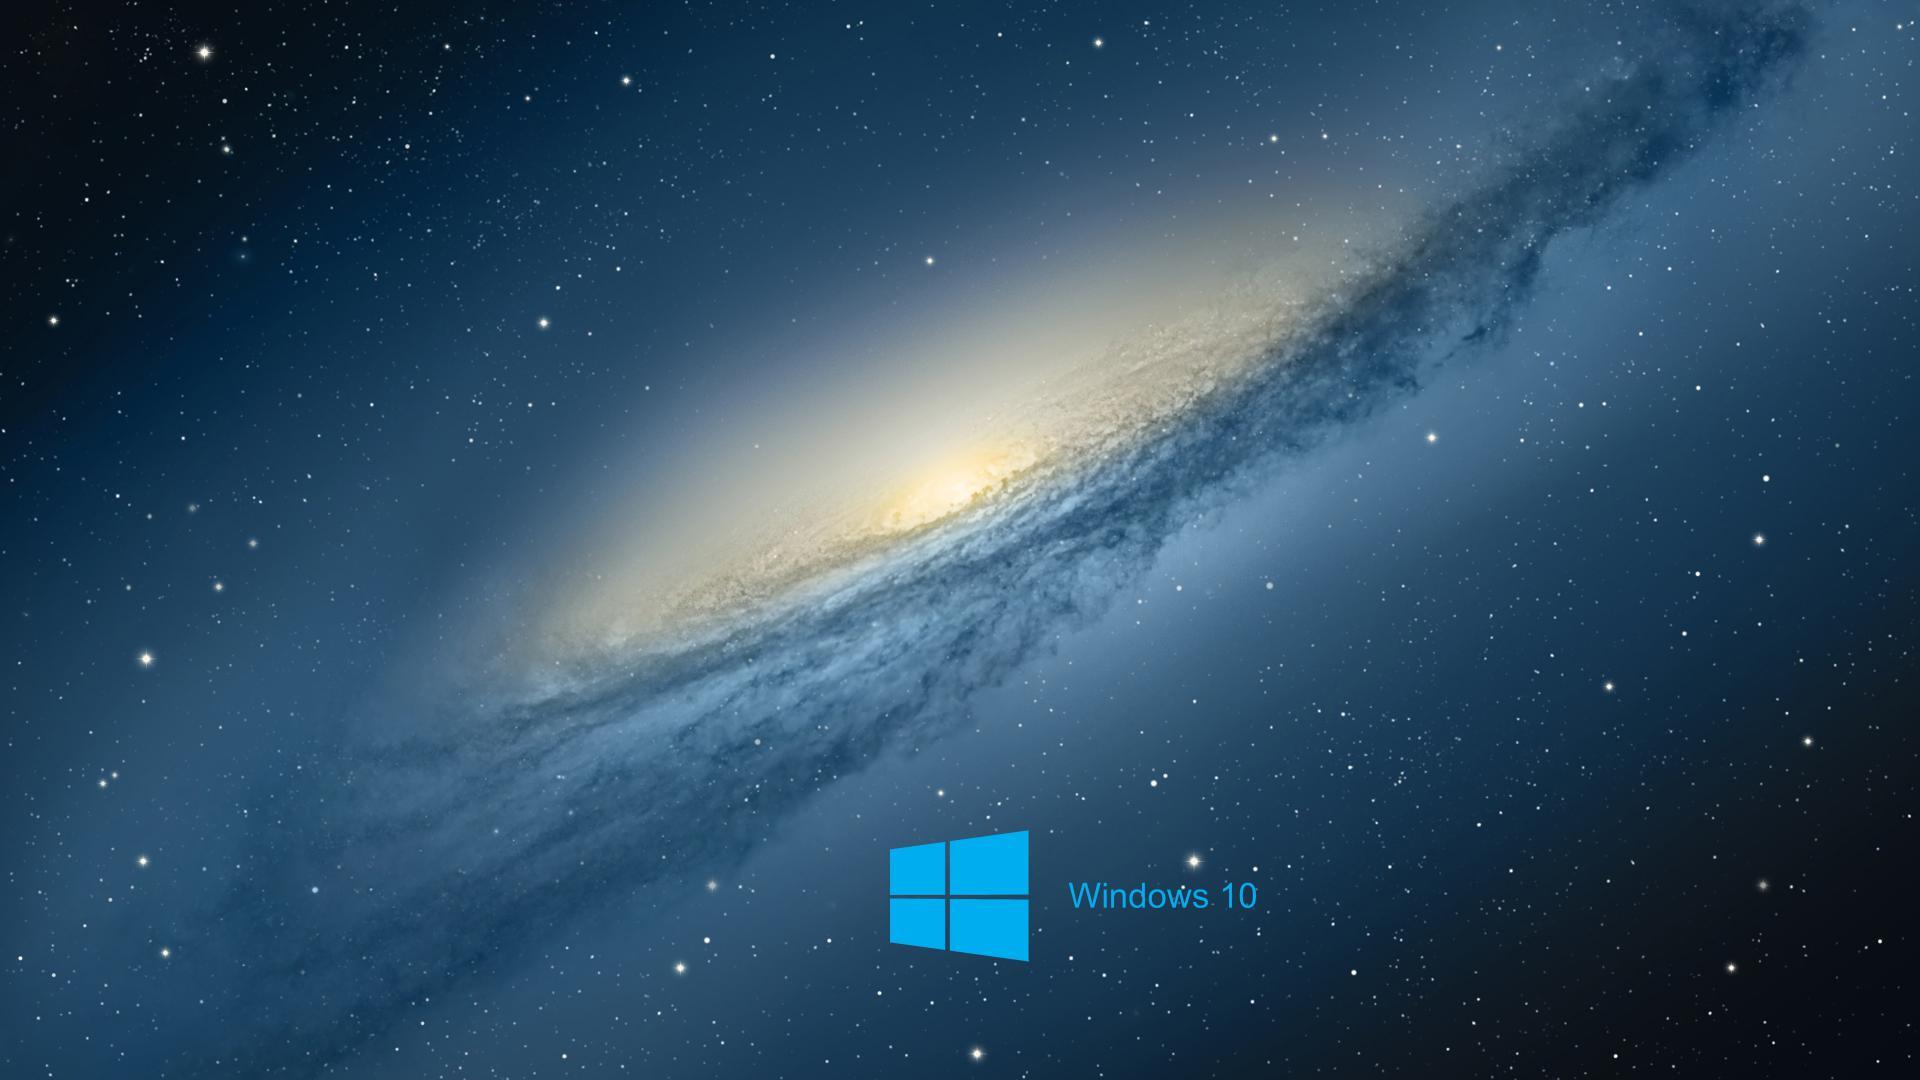 Windows 10 wallpaper hd 4k supportive guru - Windows 10 4k wallpaper pack ...